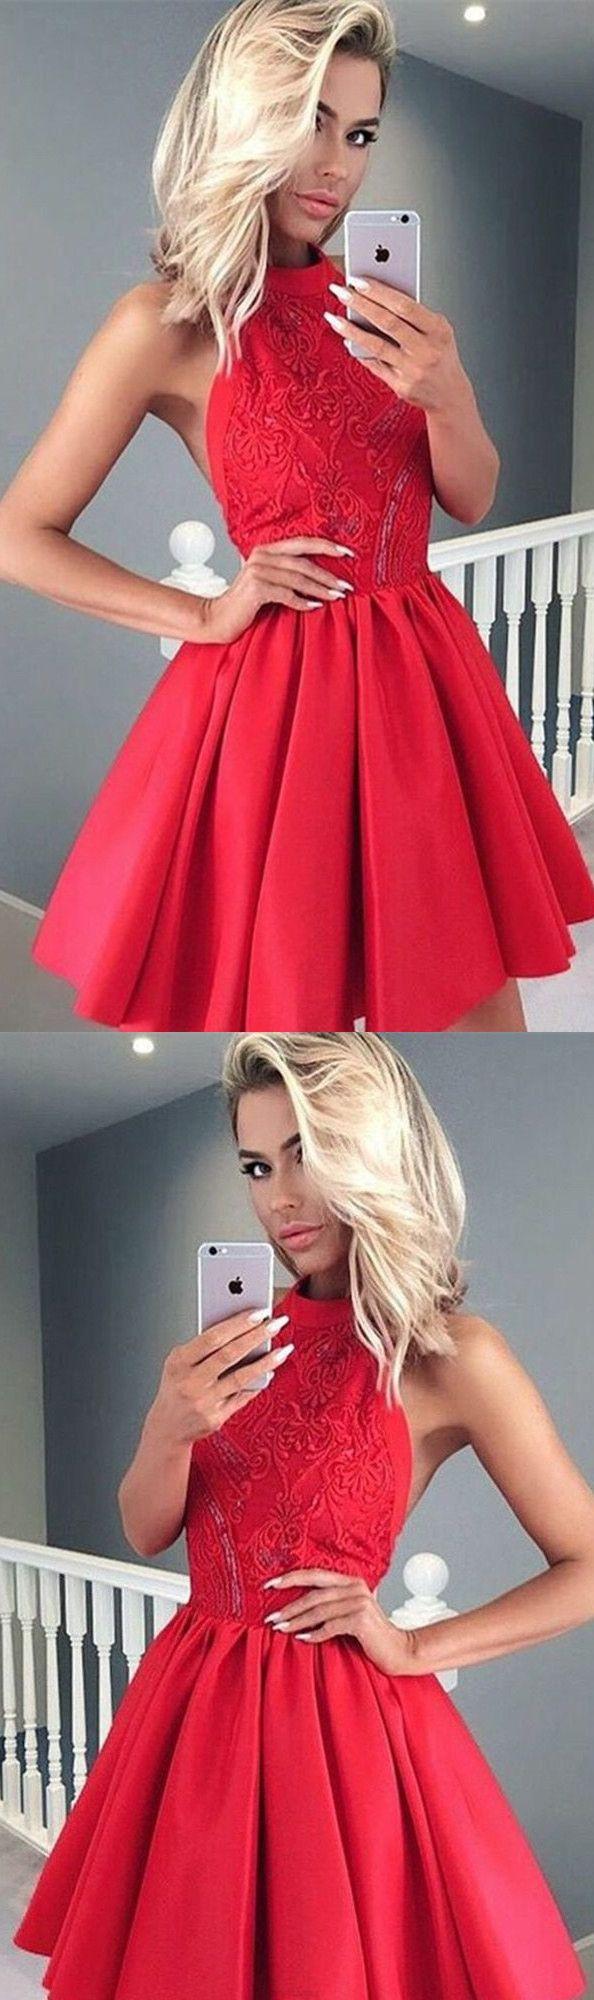 Red Prom Dresses Short Prom Dresses Sexy Prom dresses Prom